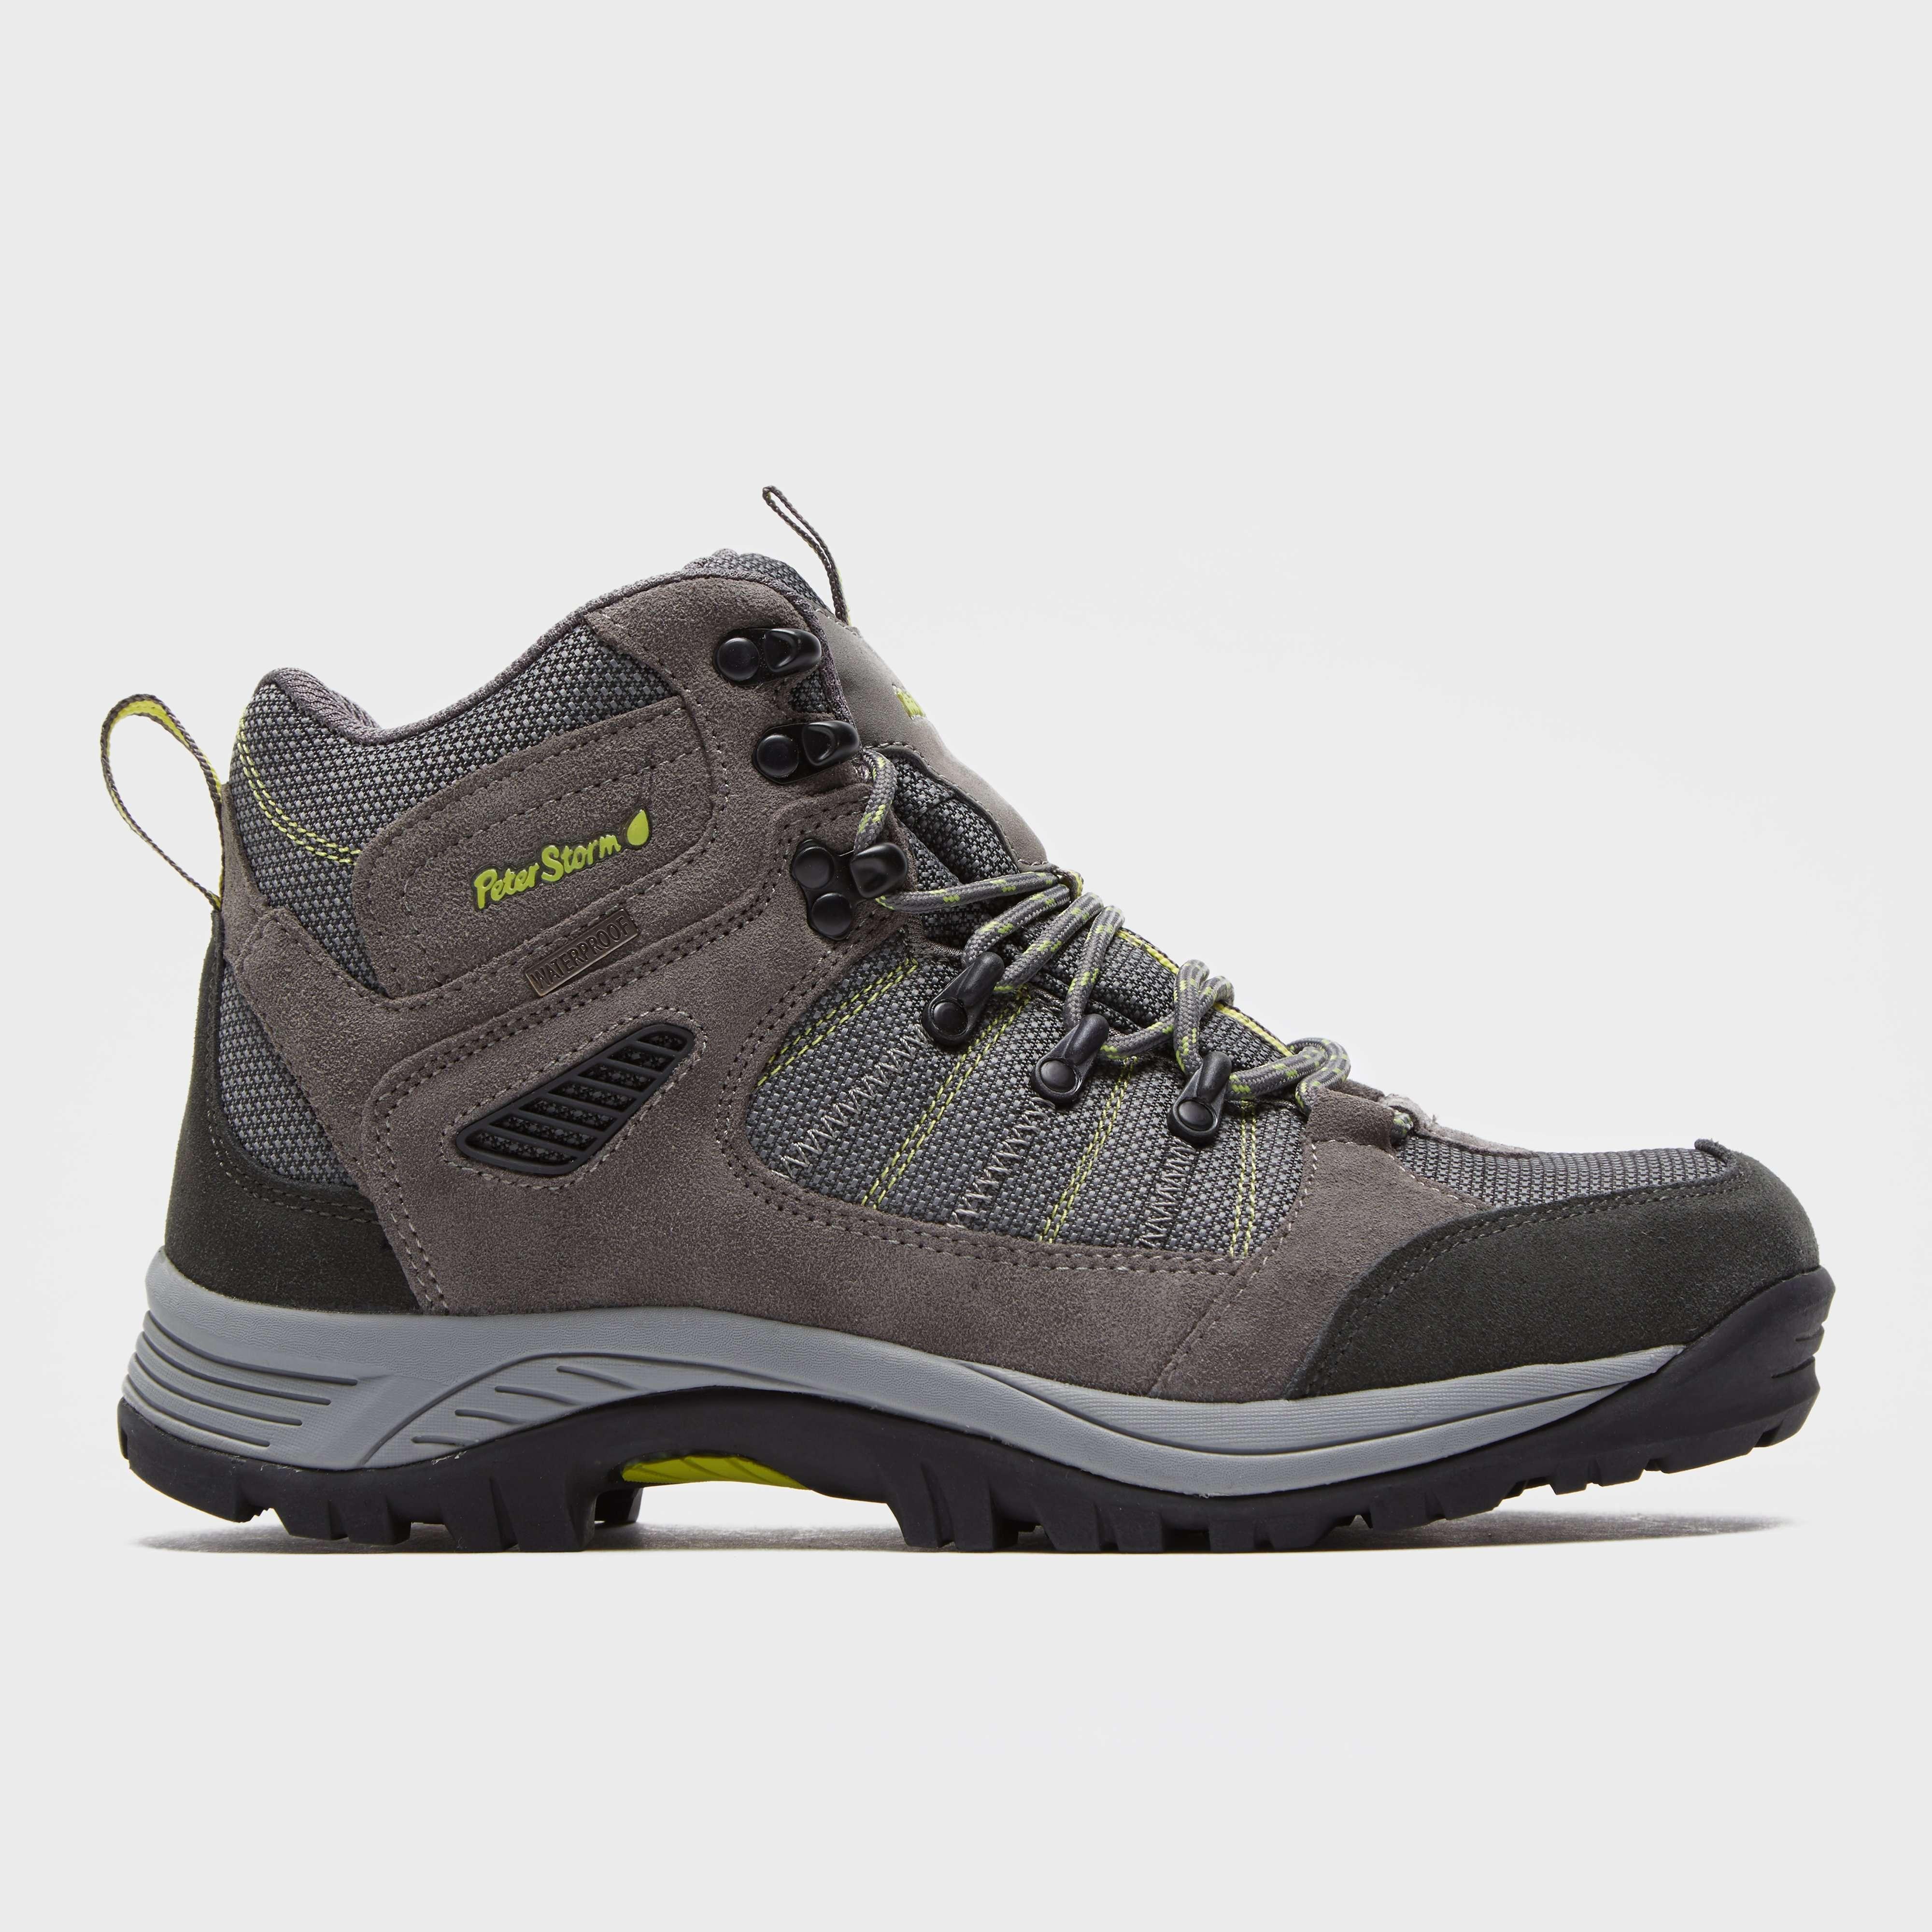 PETER STORM Men's Malvern Walking Boots